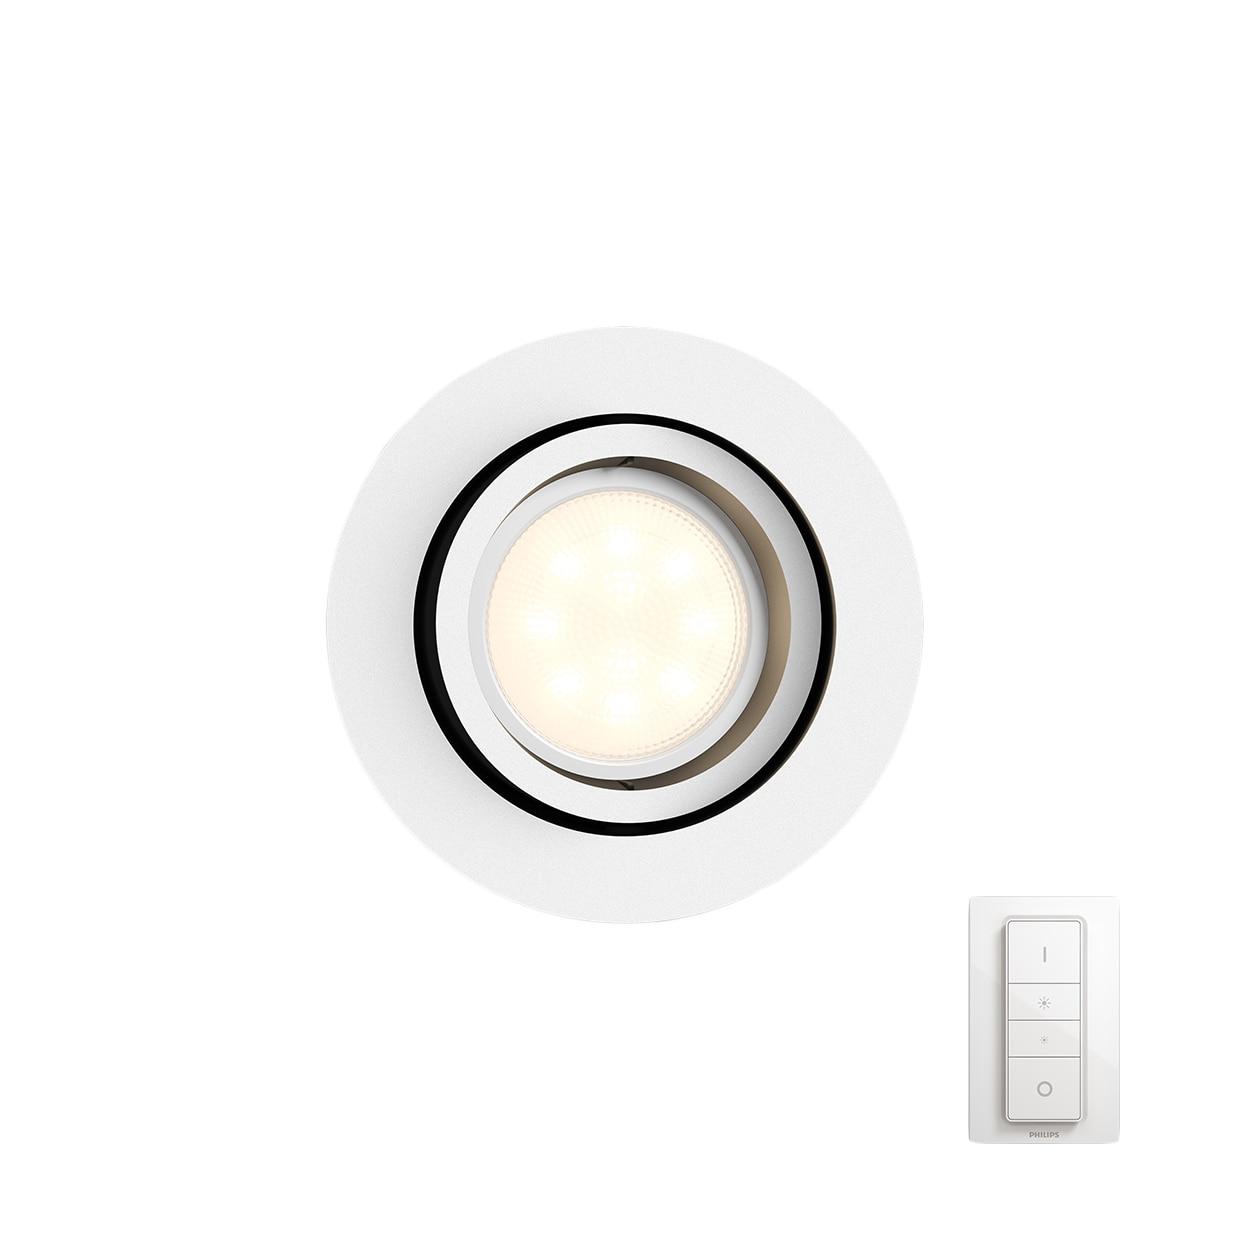 Fotografie Spot inteligent LED Philips Hue MILLISKIN, rotund, GU10, 5.5W (25W), 250 lm, A++, IP20, Alb, Dimmer switch inclus